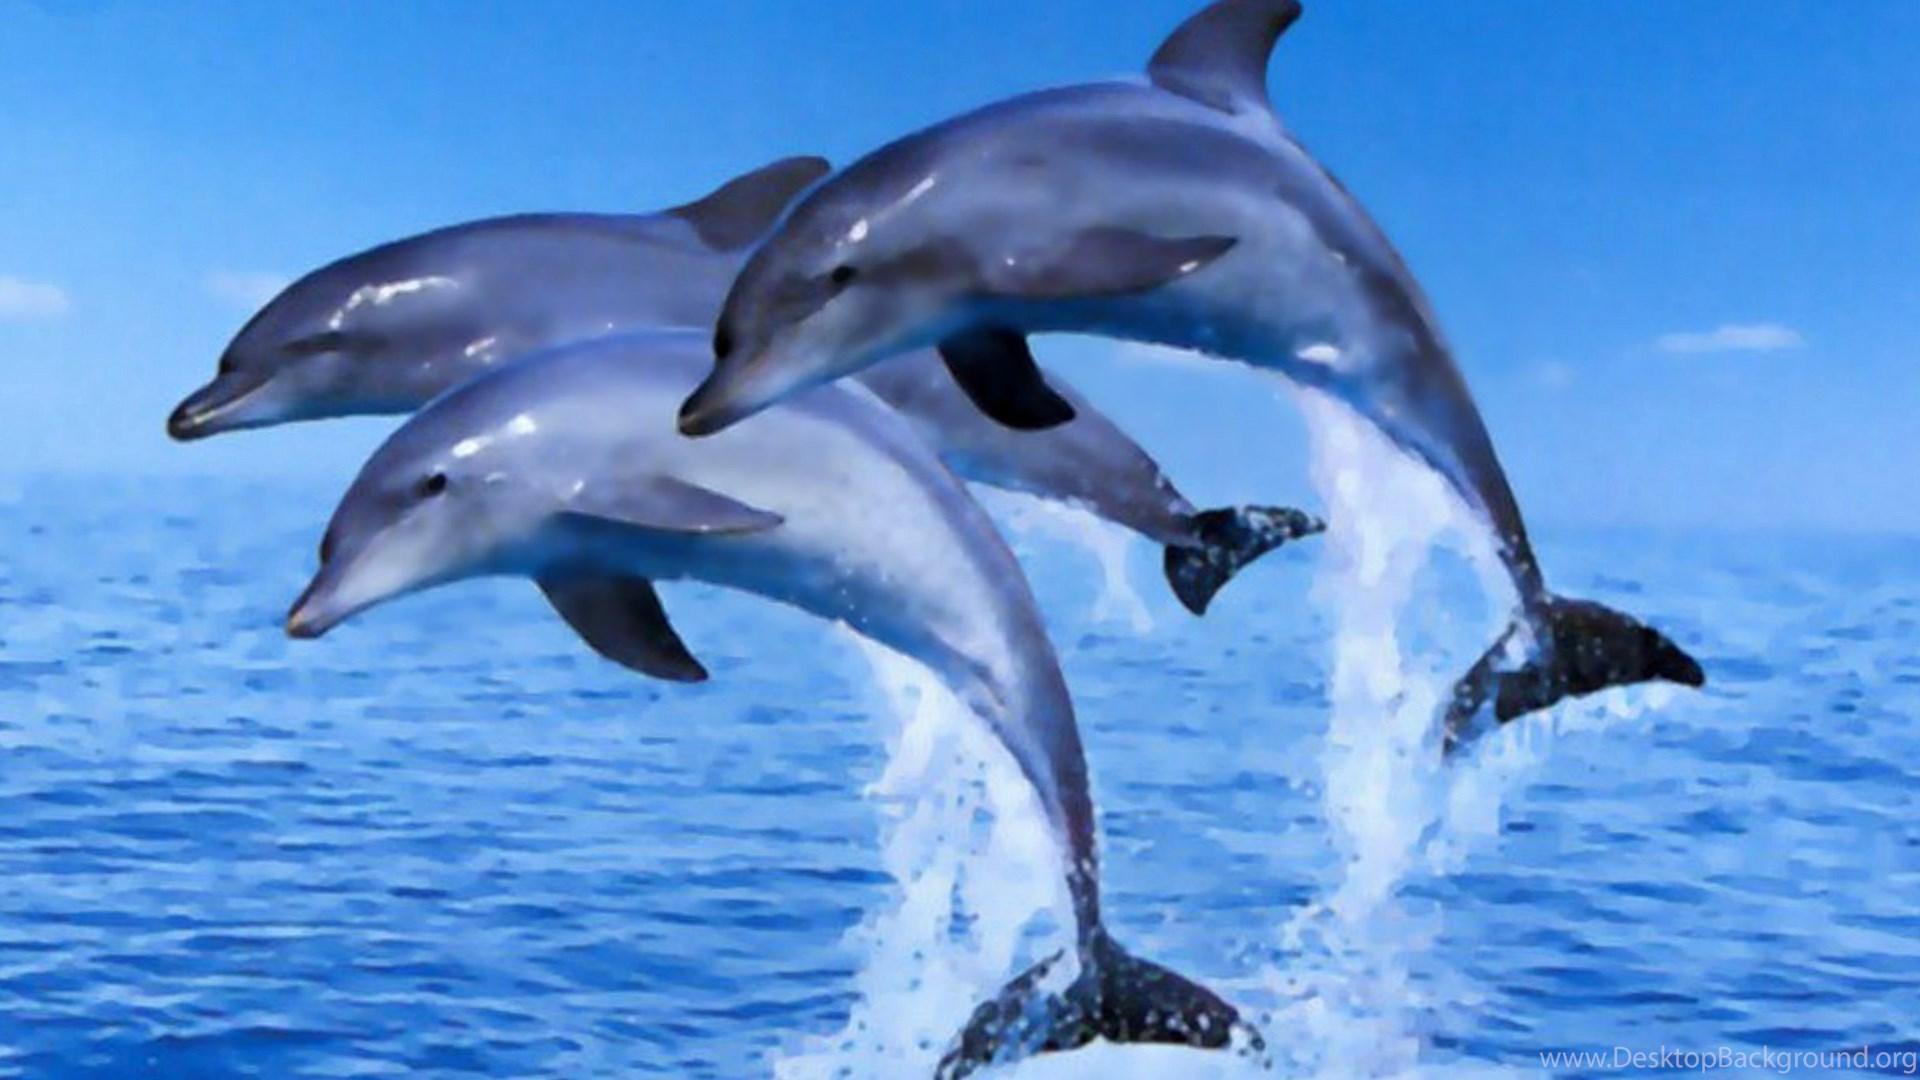 dolphins jumping clipart wallpaper desktop background